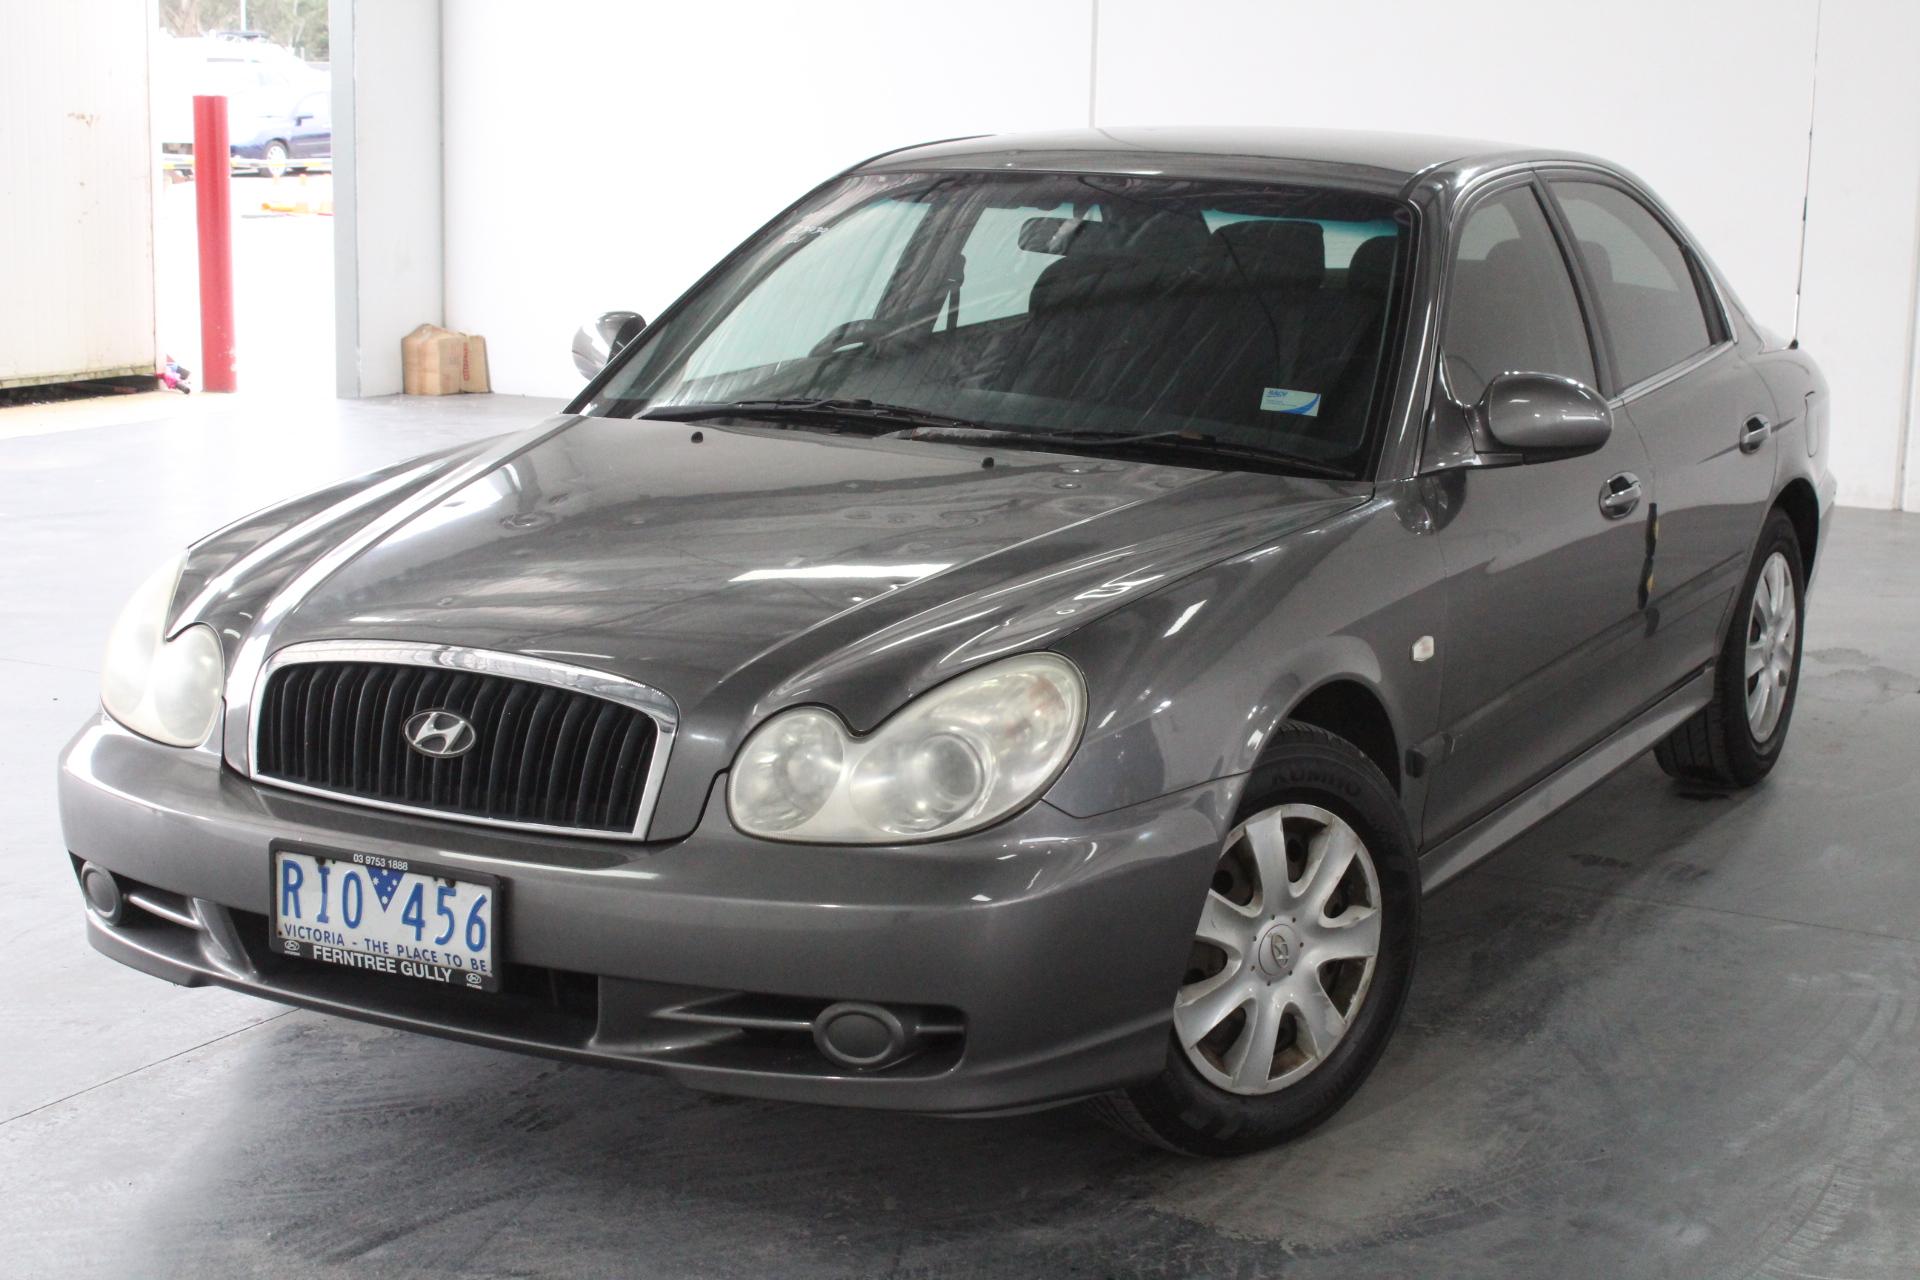 2001 Hyundai Sonata GL EF-B Automatic Sedan